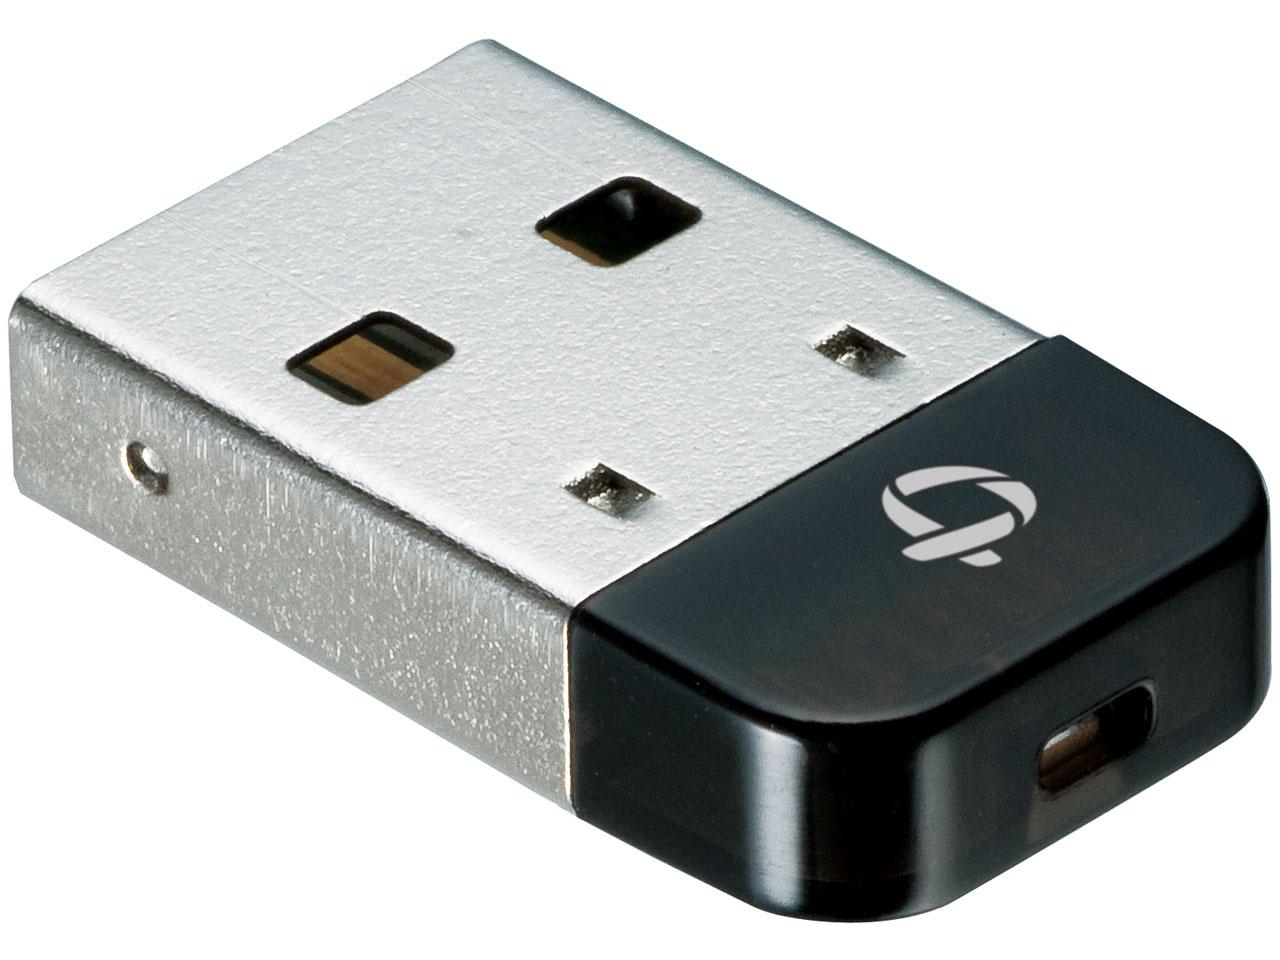 BT-Micro4 の製品画像